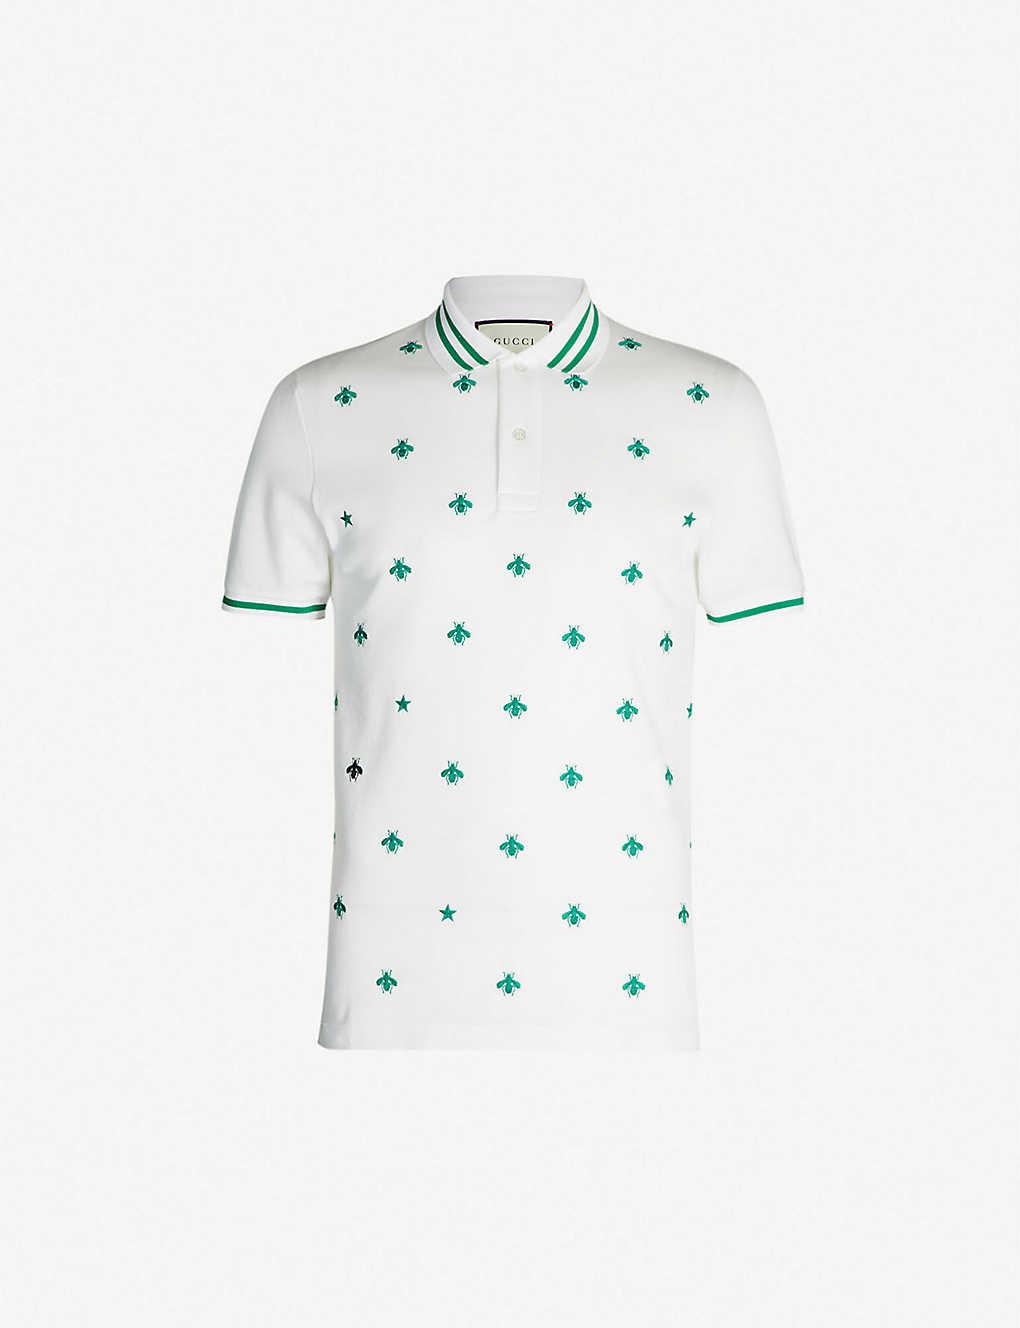 b176d4edb94 GUCCI - Bee-embroidered stretch cotton-piqué polo shirt | Selfridges ...